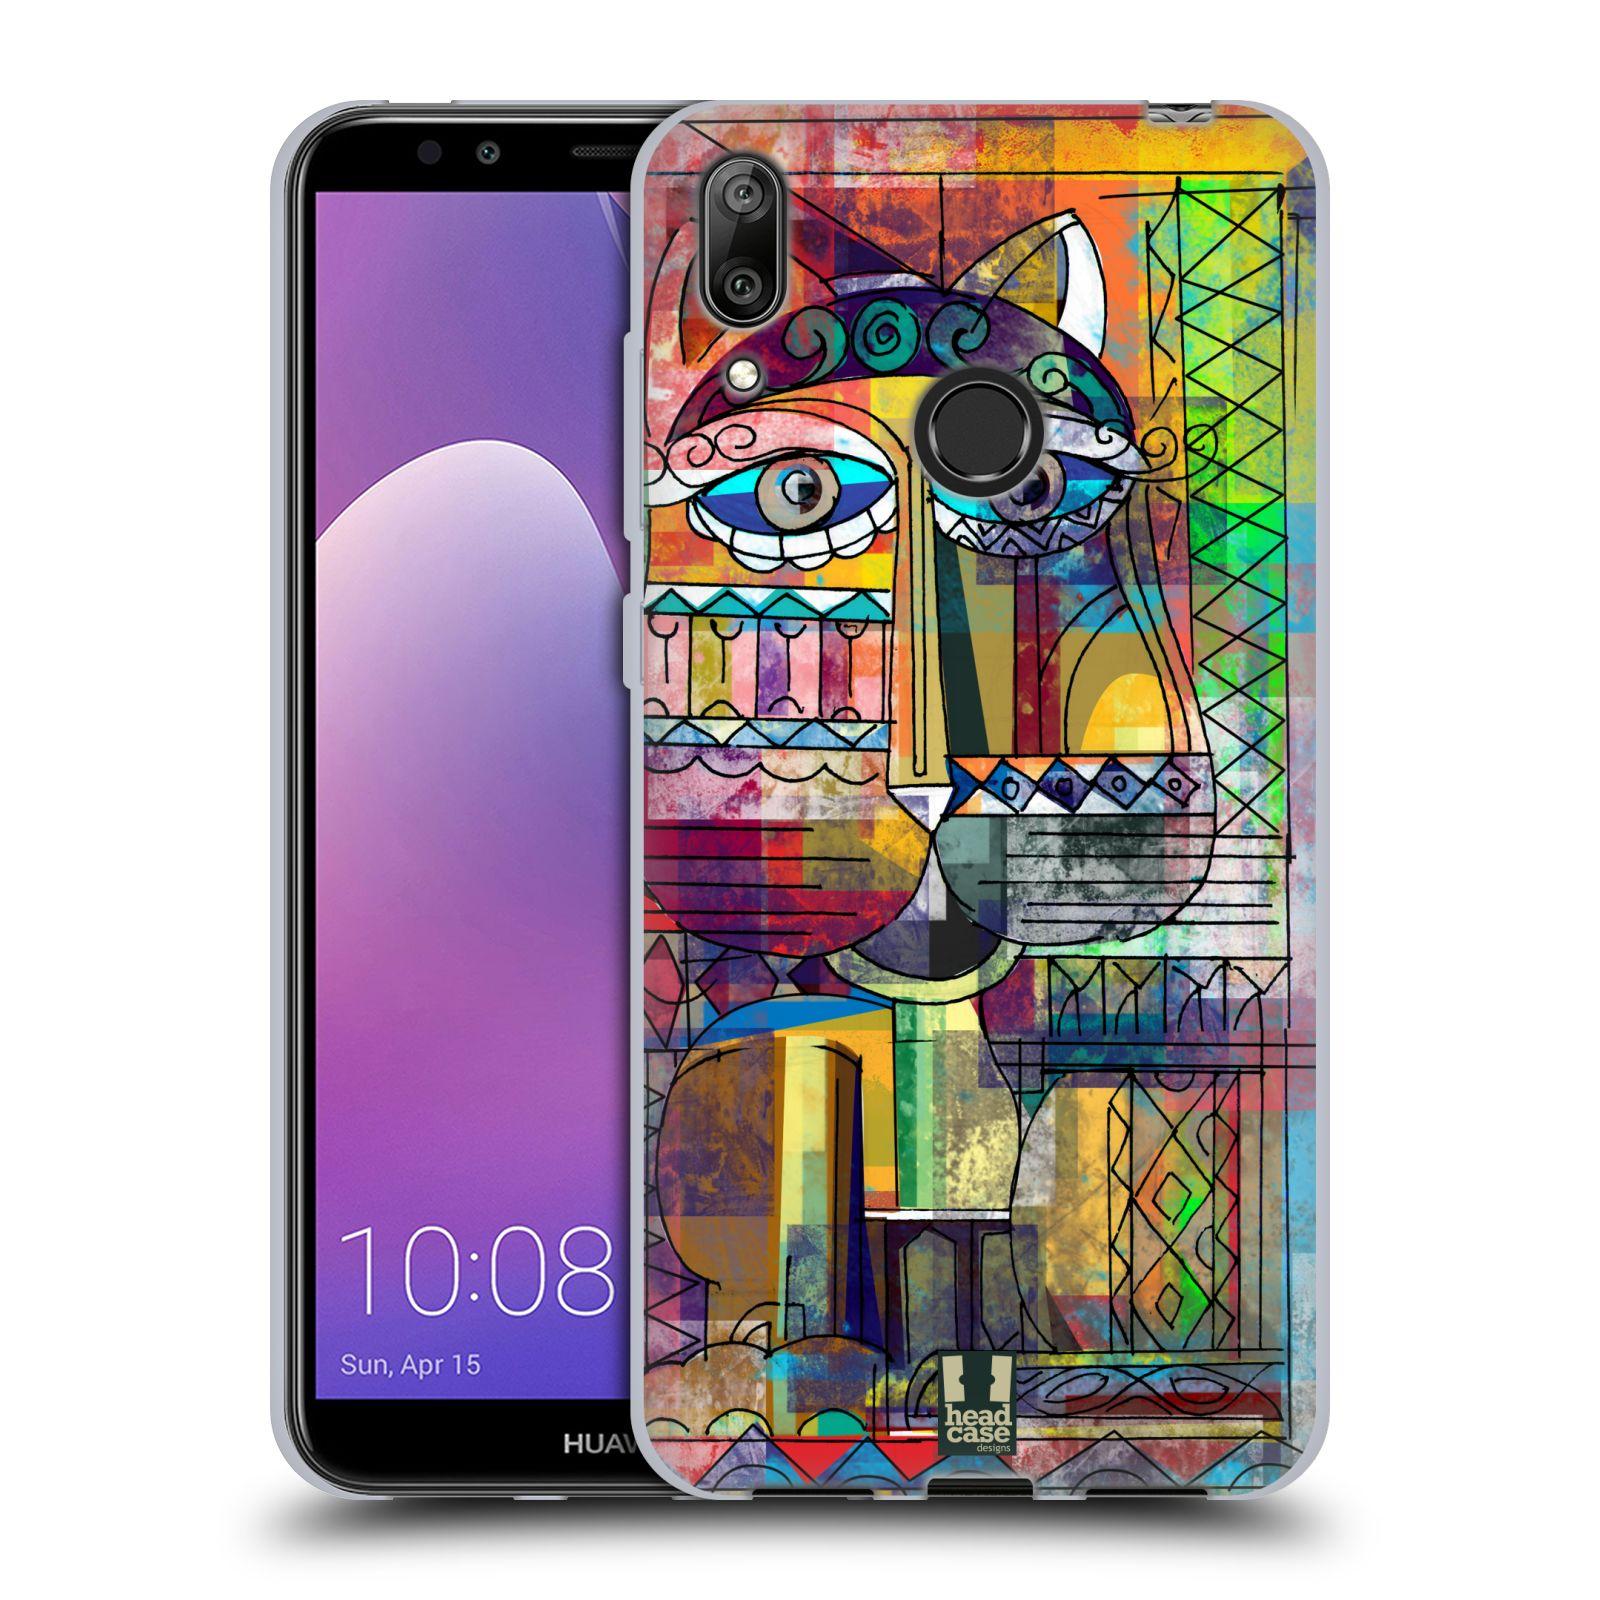 Silikonové pouzdro na mobil Huawei Y7 (2019) - Head Case - AZTEC KORAT